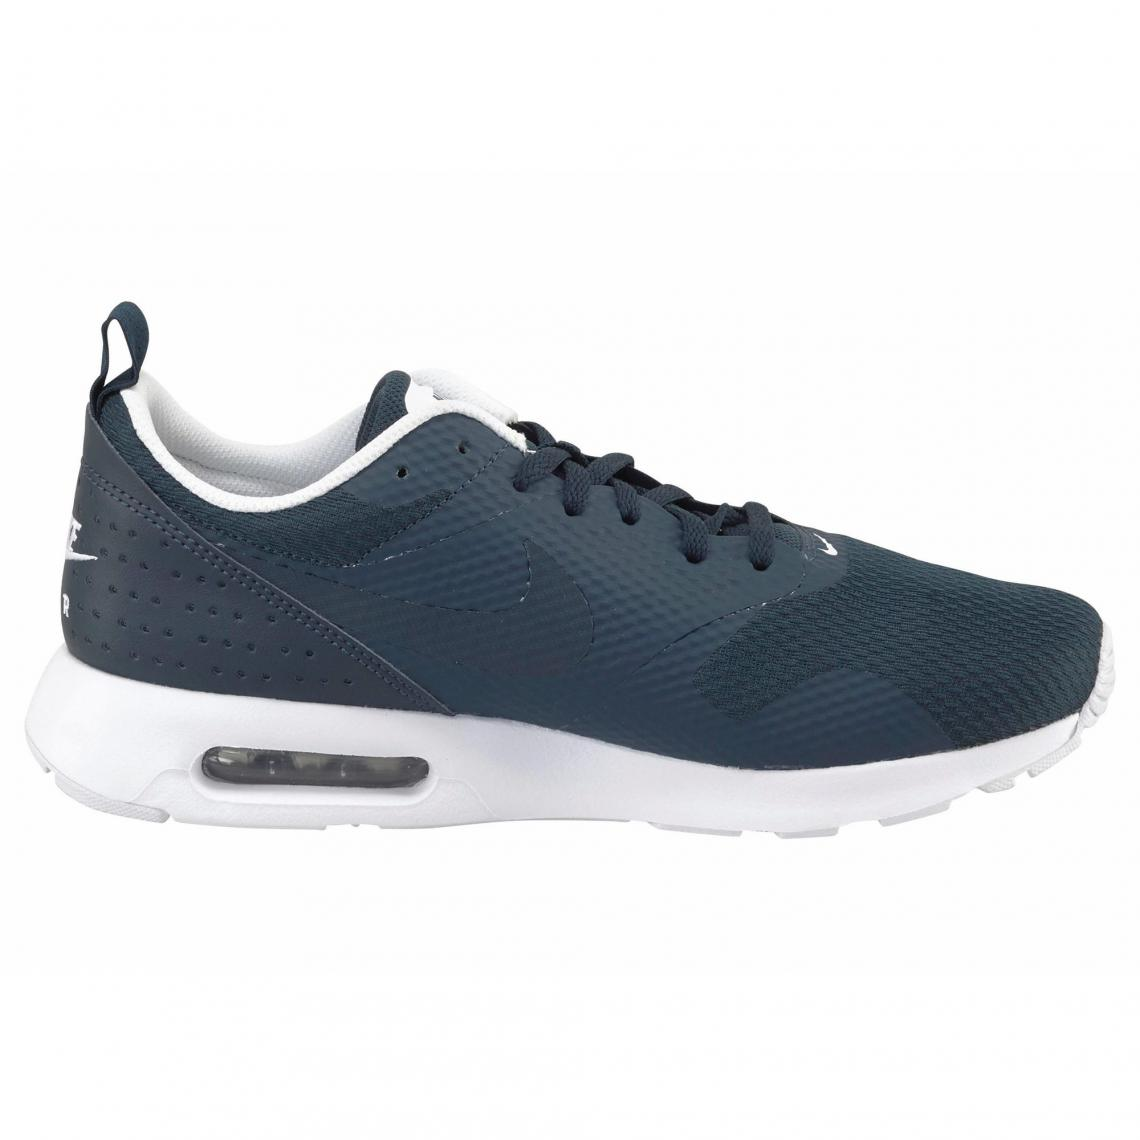 Chaussures 3suisses Air De Tavas Homme Running Max Marine Nike wqatcHRKq